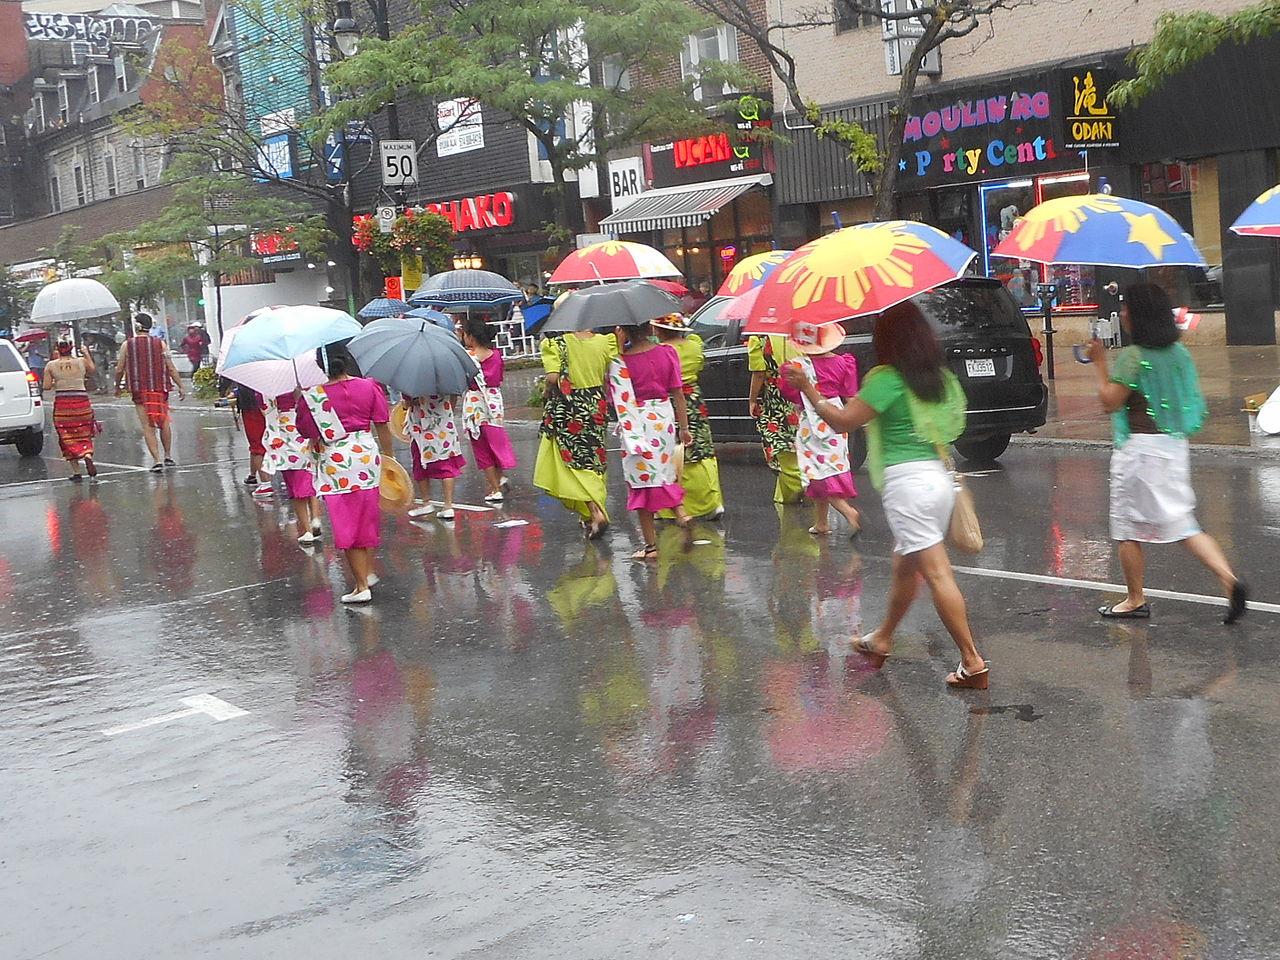 File:Canada Day 2015 on Saint Catherine Street - 261a.jpg - Wikimedia